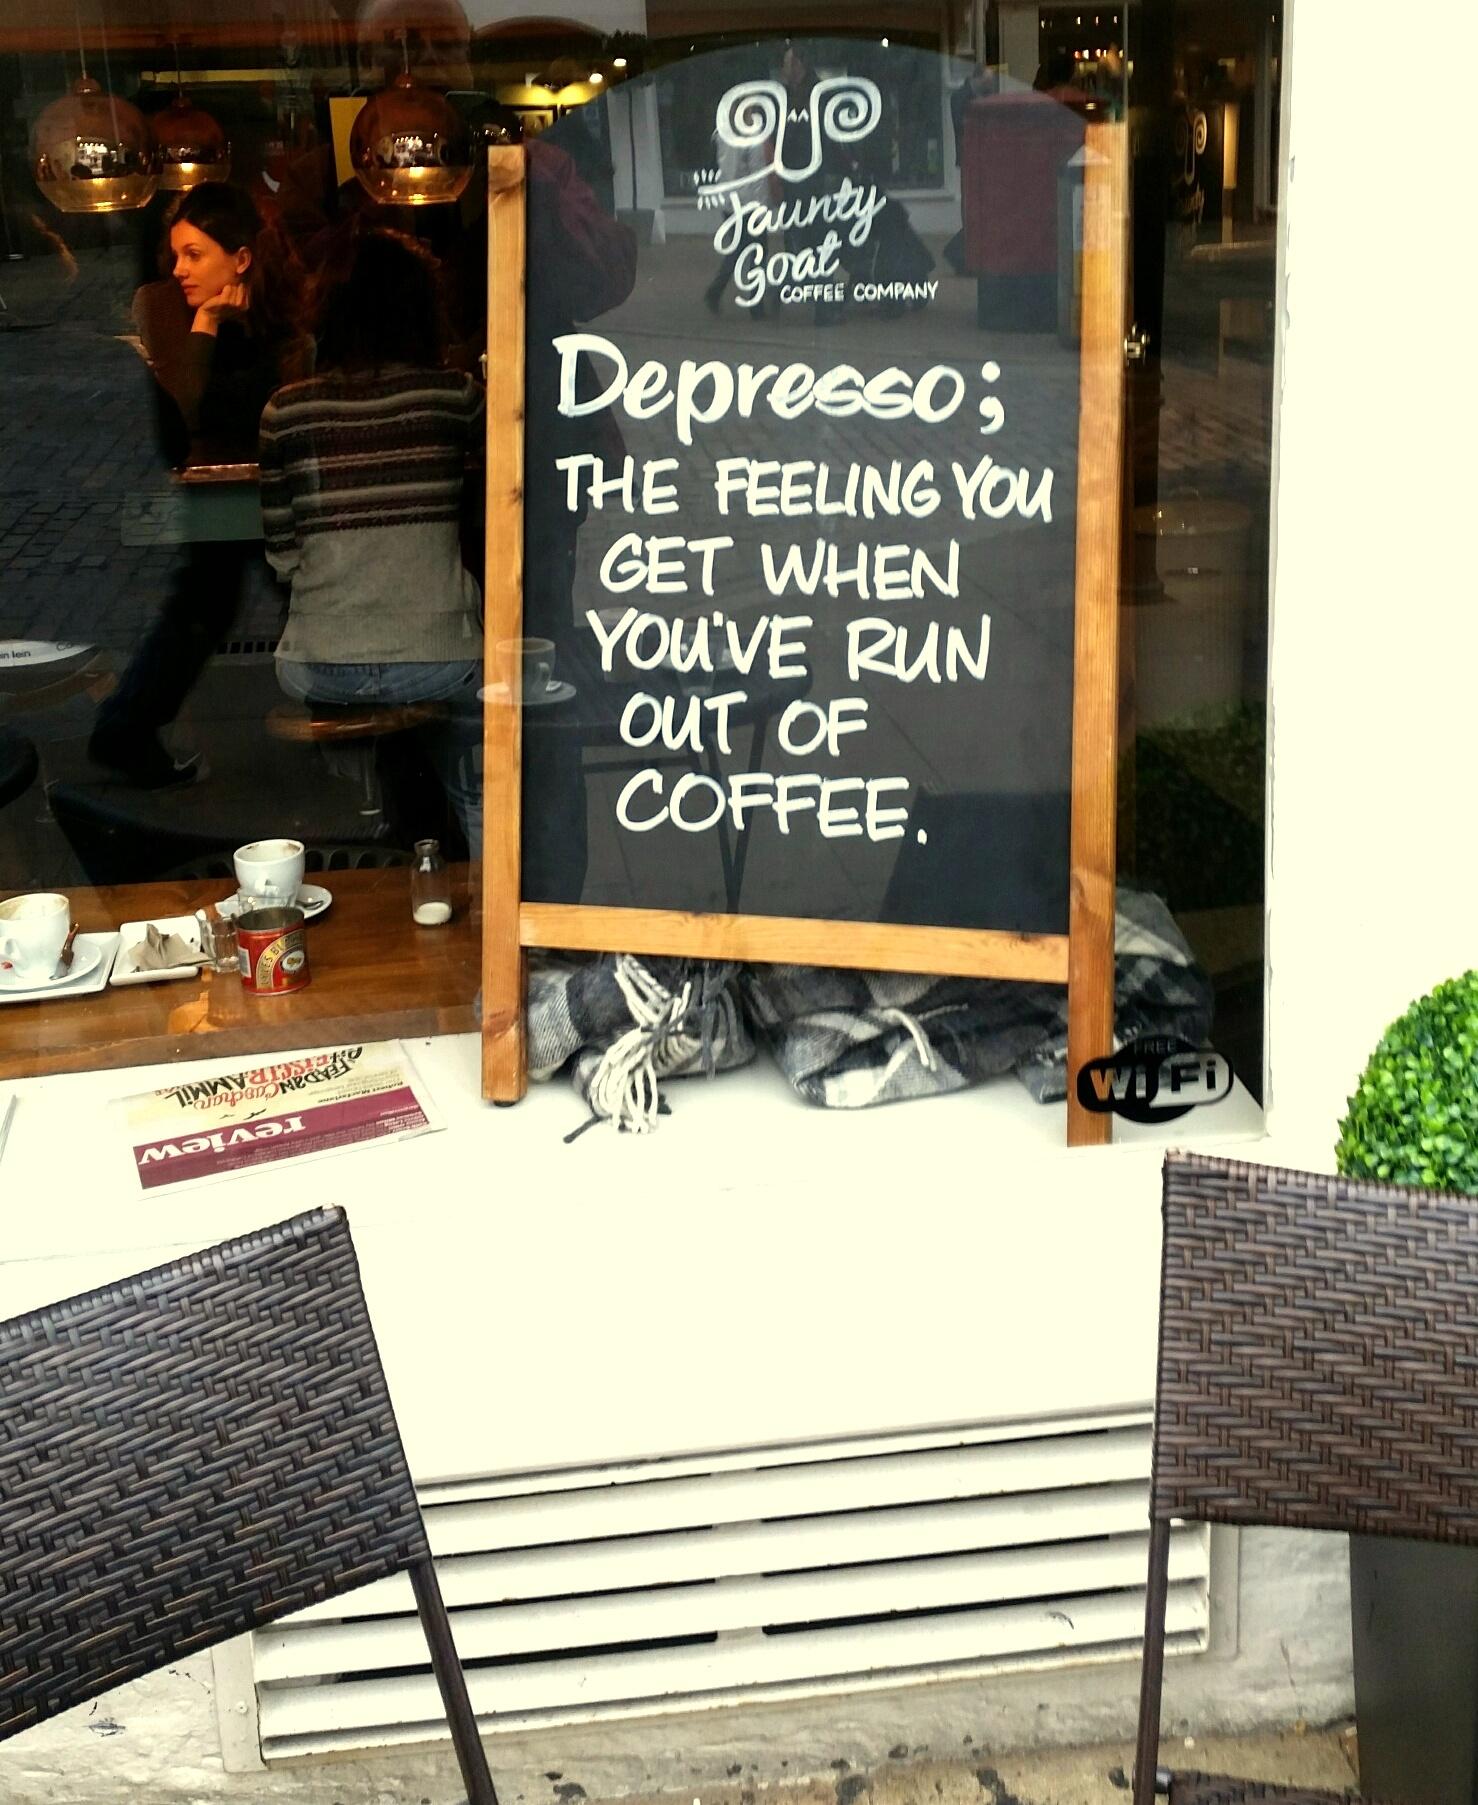 depresso defined